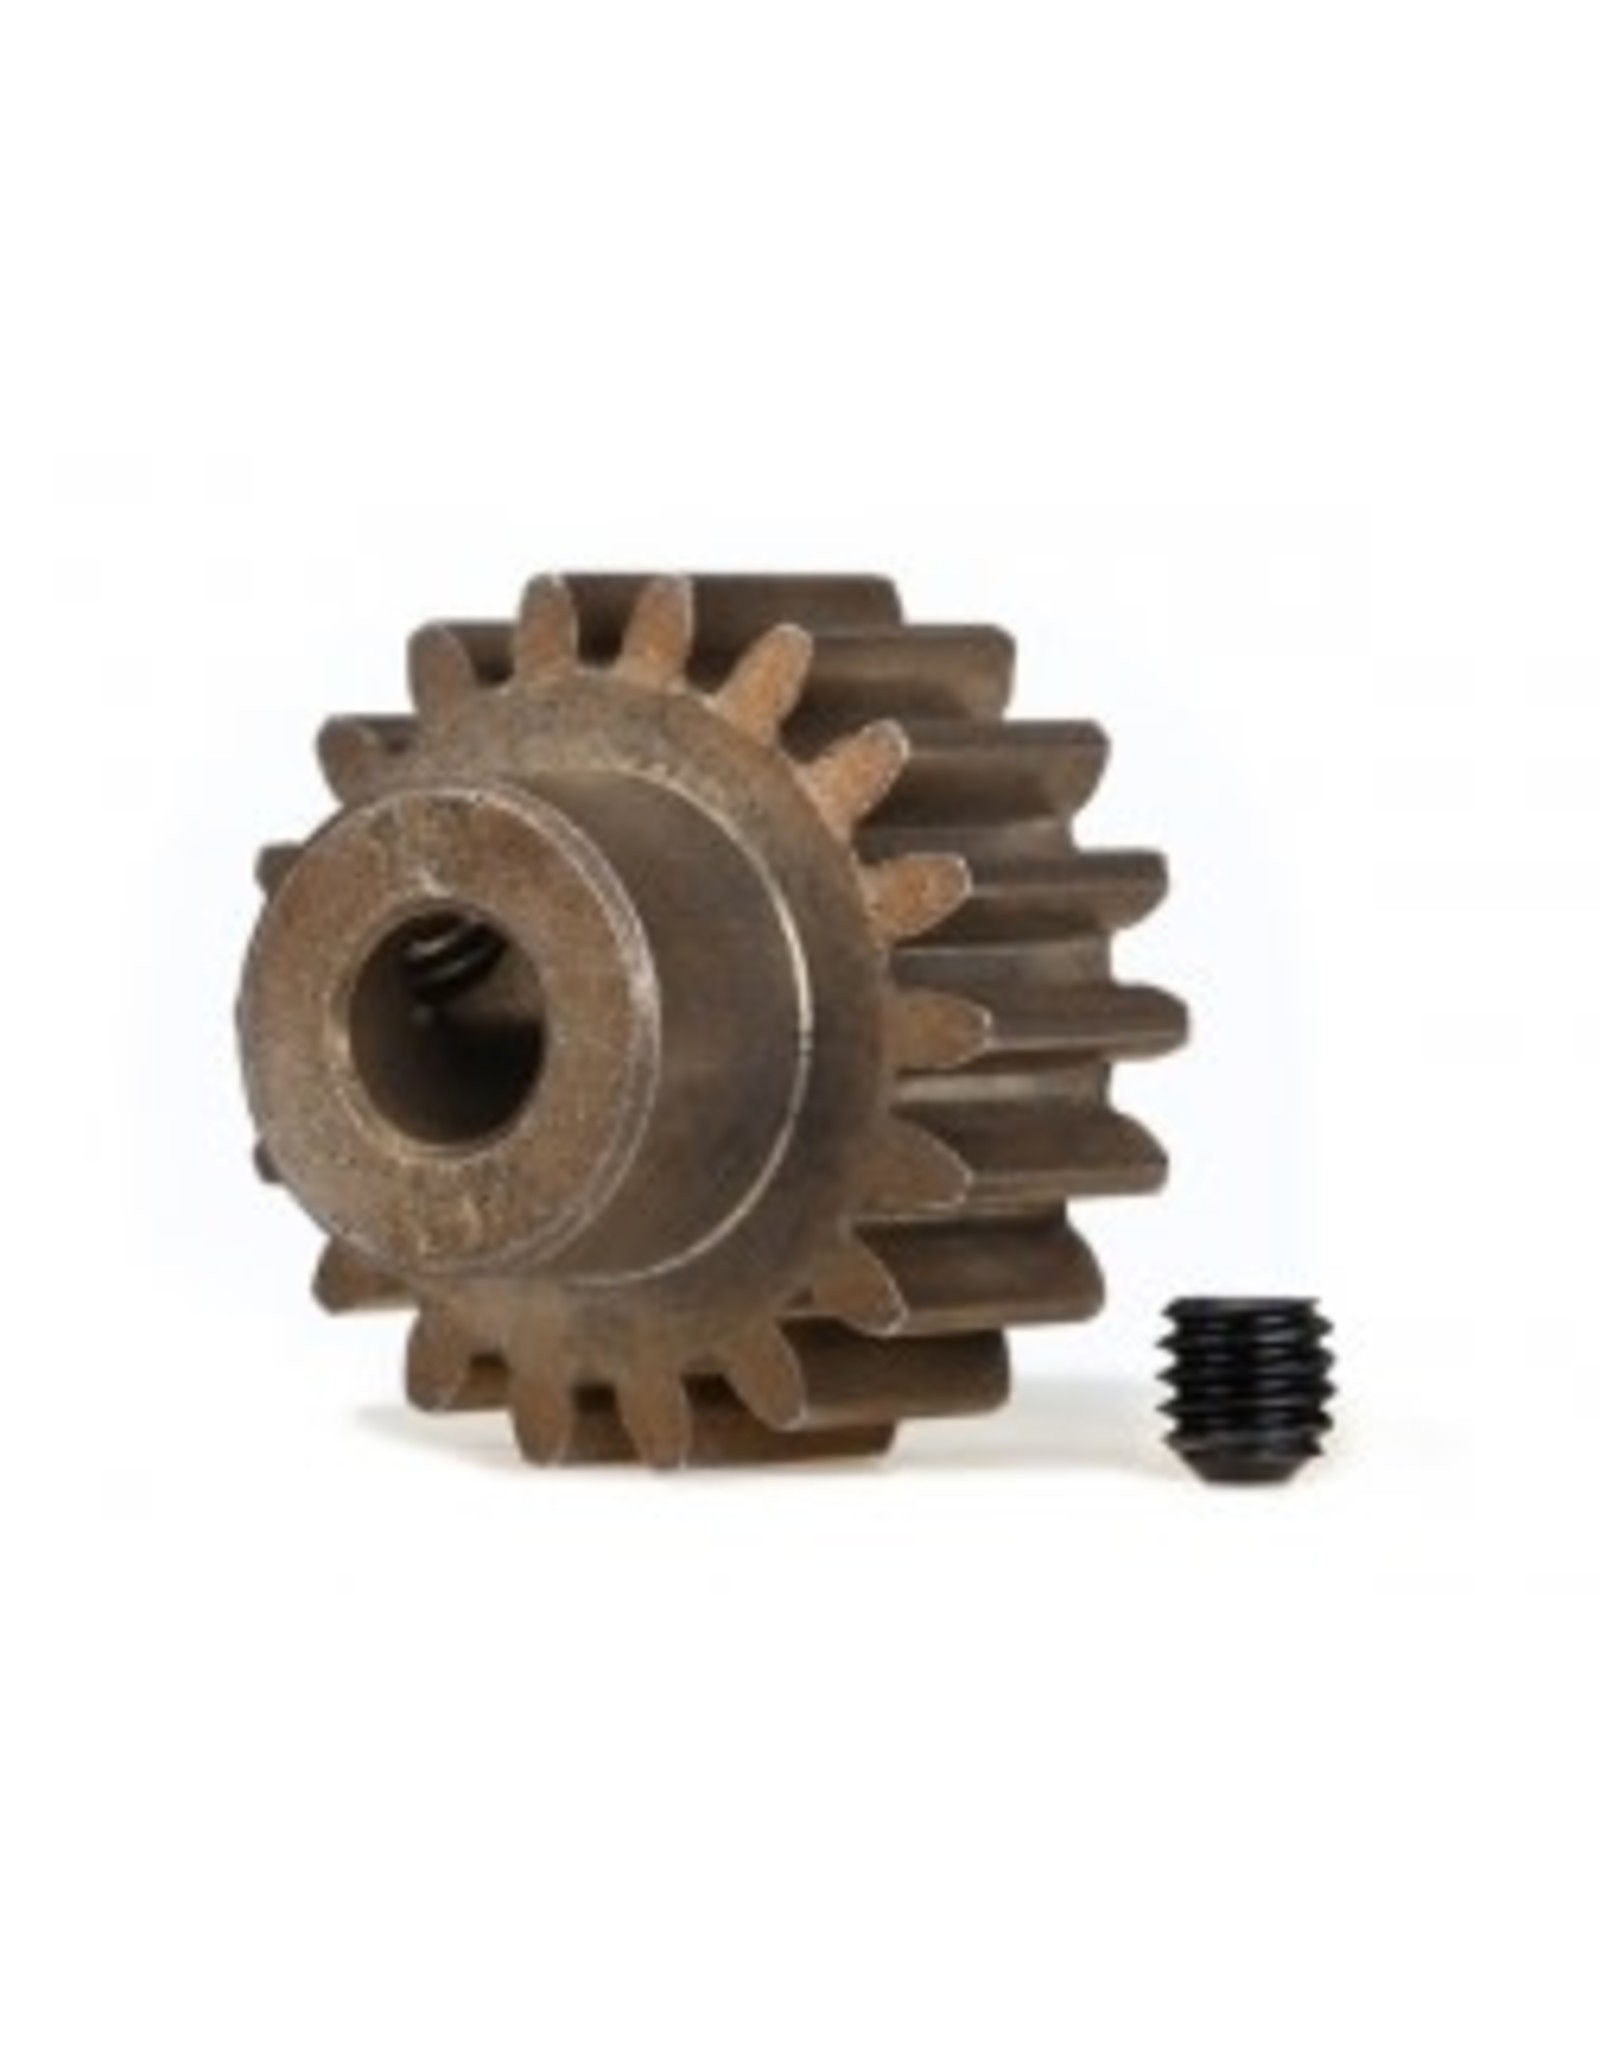 Traxxas [Gear, 18-T pinion (1.0 metric pitch) (fits 5mm shaft)/ set screw] Gear, 18-T pinion (1.0 metric pitch) (fits 5mm shaft)/ set screw